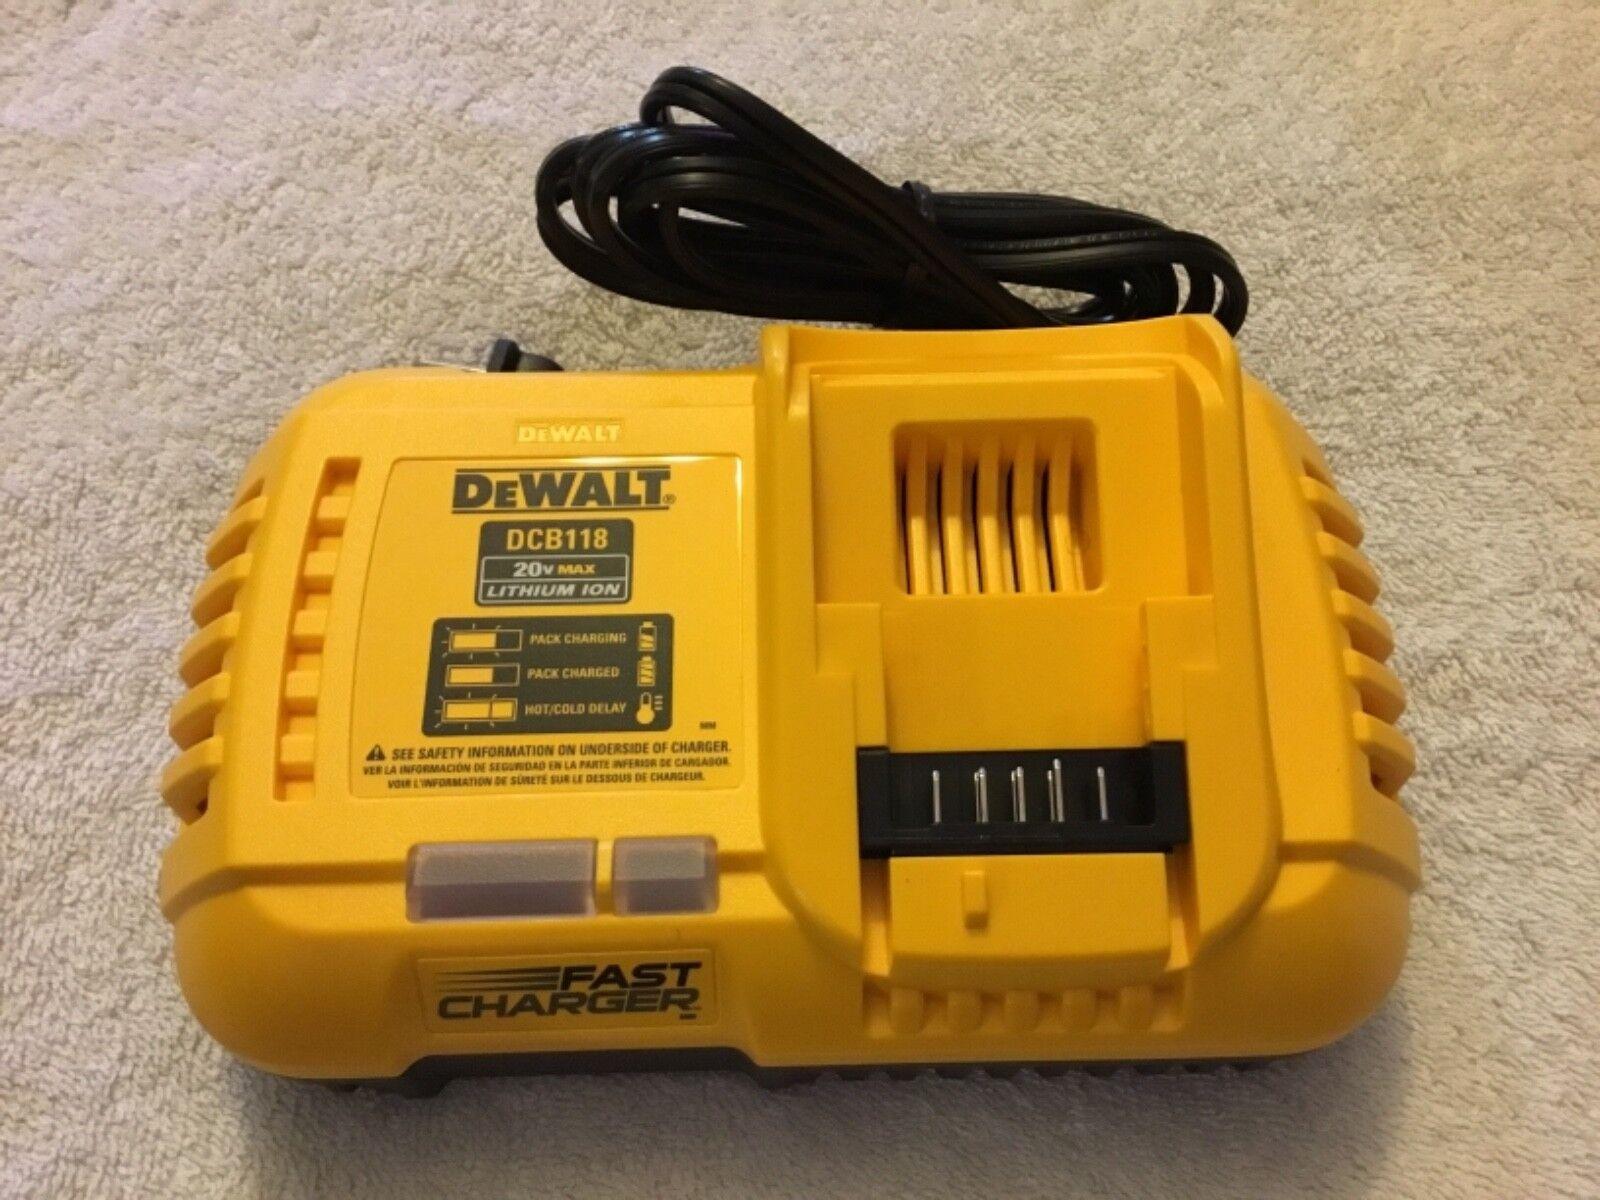 7041766 Center Track Shock GAS Polaris Indy 600 RMK 1999-2001 Snowmobile Part# 54-2350 OEM# 7041743